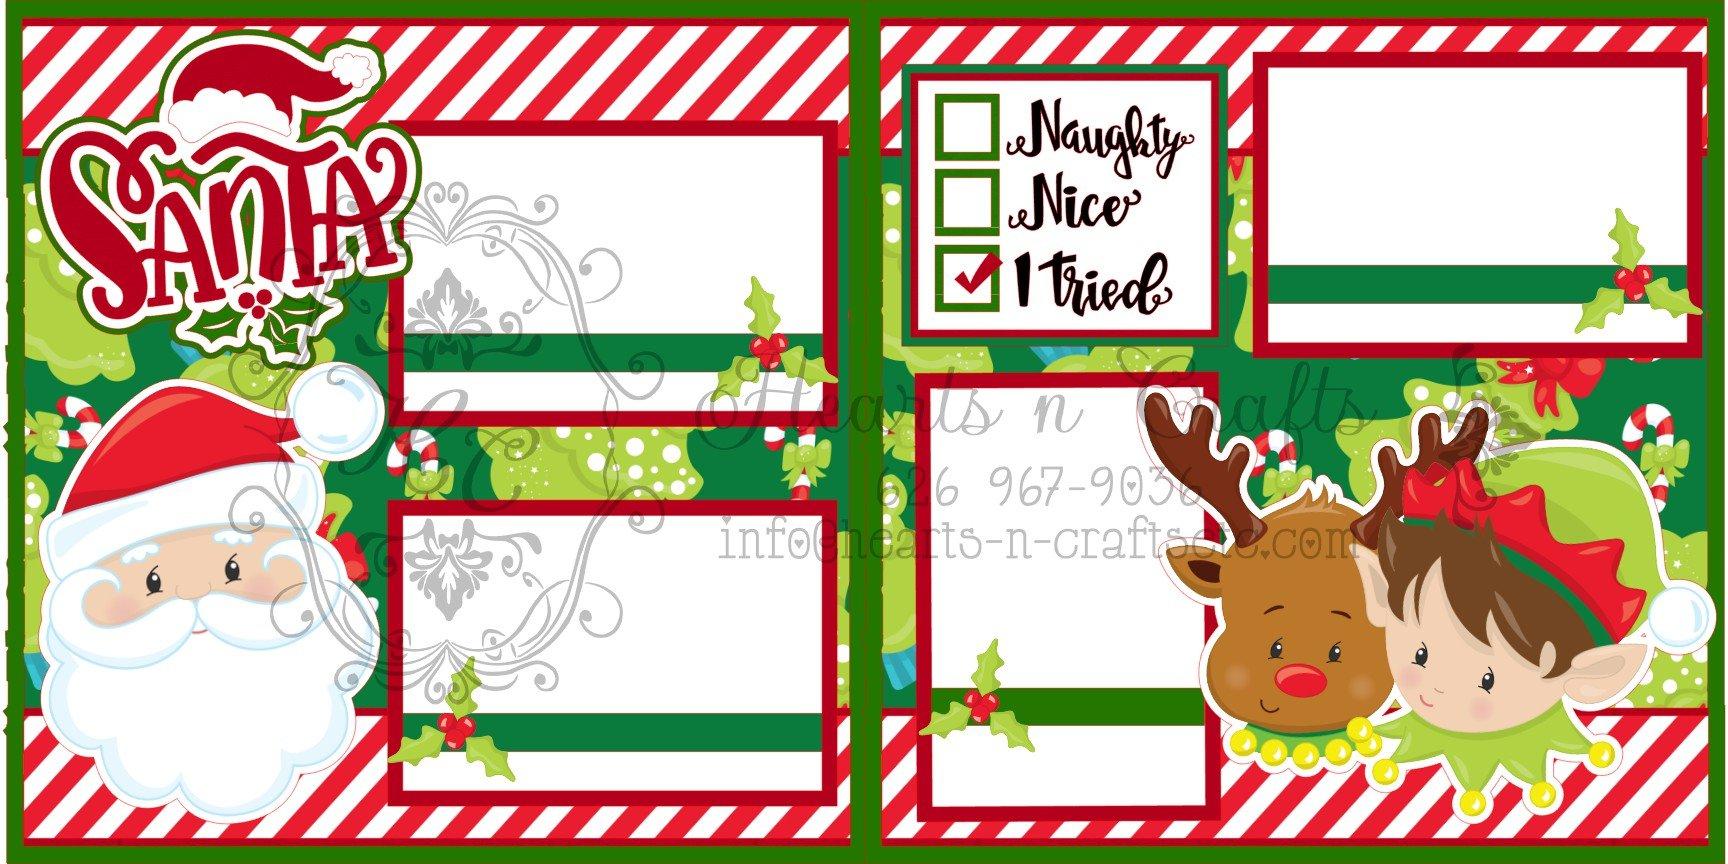 Santa - I Tried 2 page layout